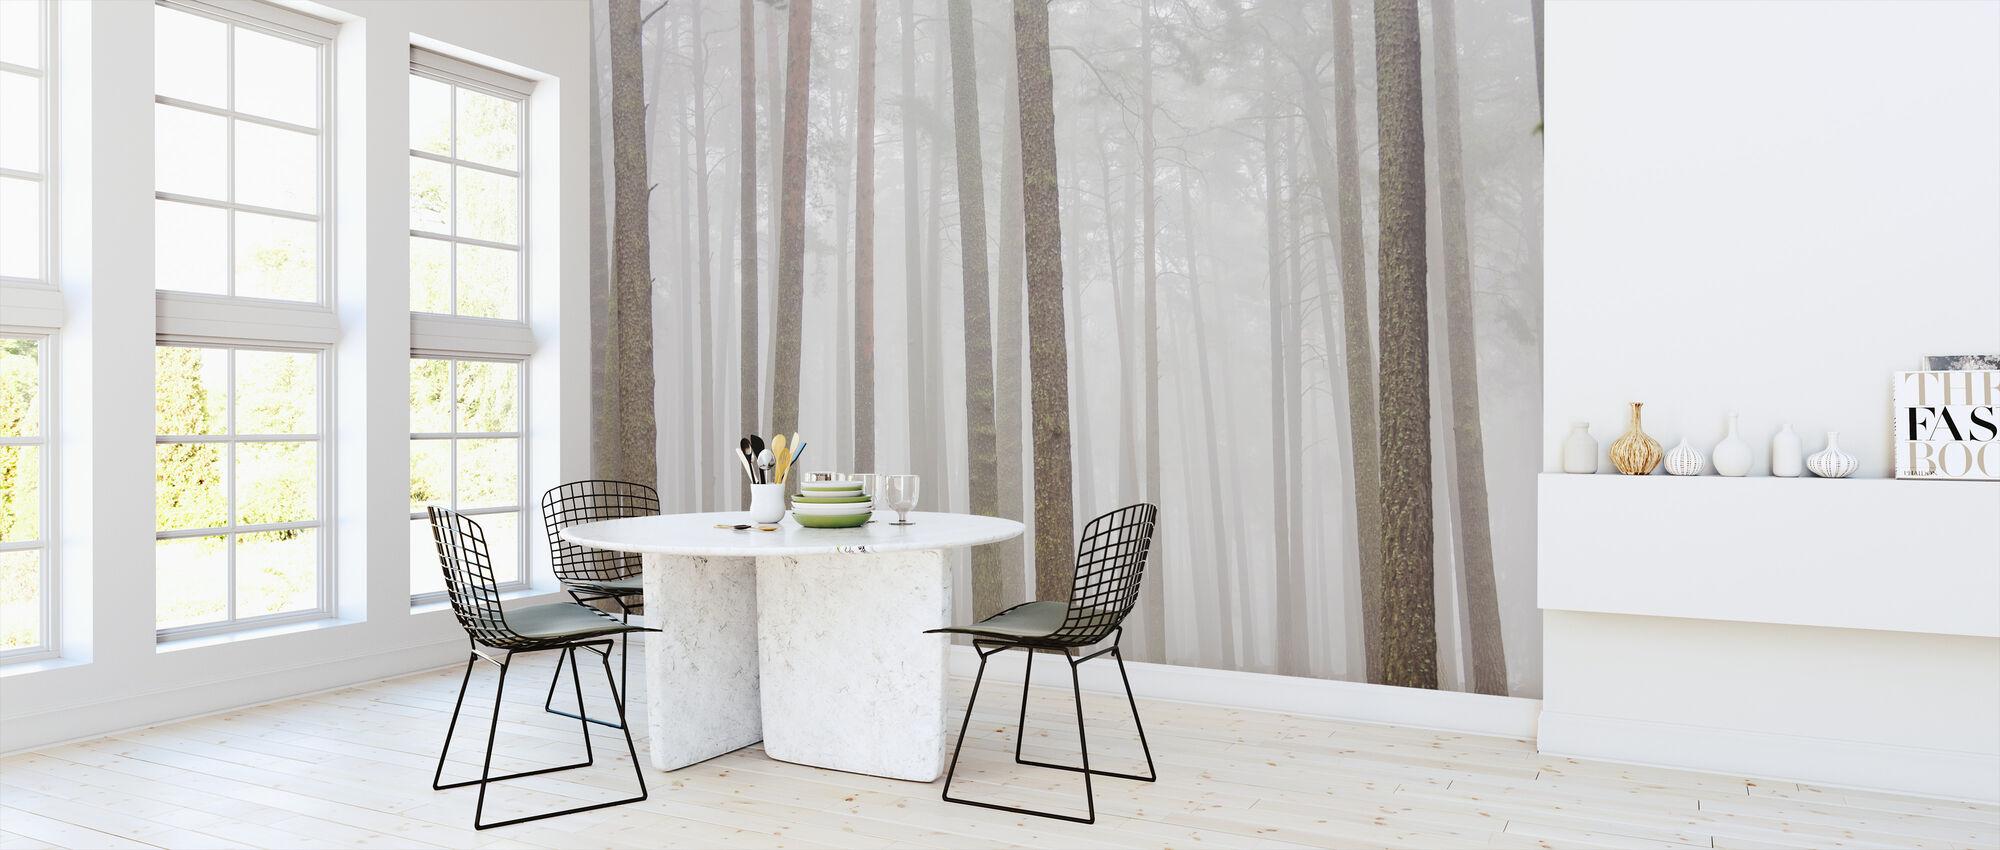 Misty Trees - Wallpaper - Kitchen